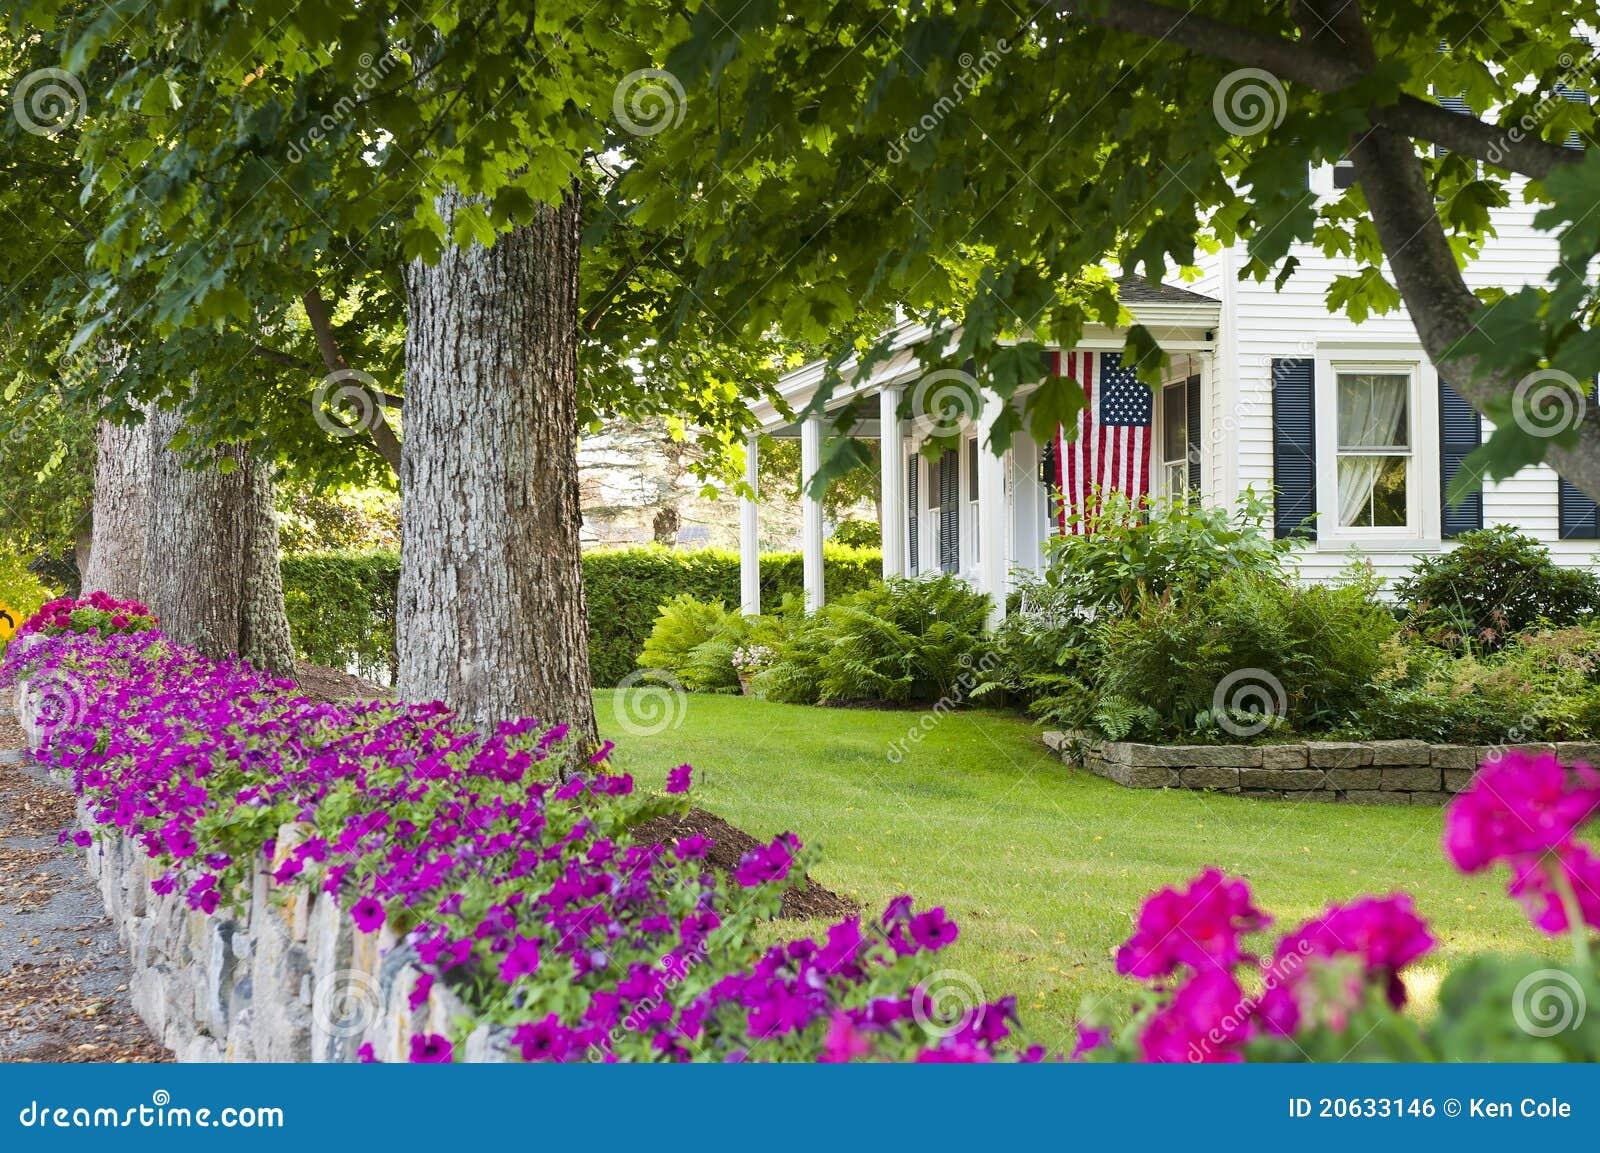 Country house rock garden royalty free stock image image - Casa campo y jardin ...